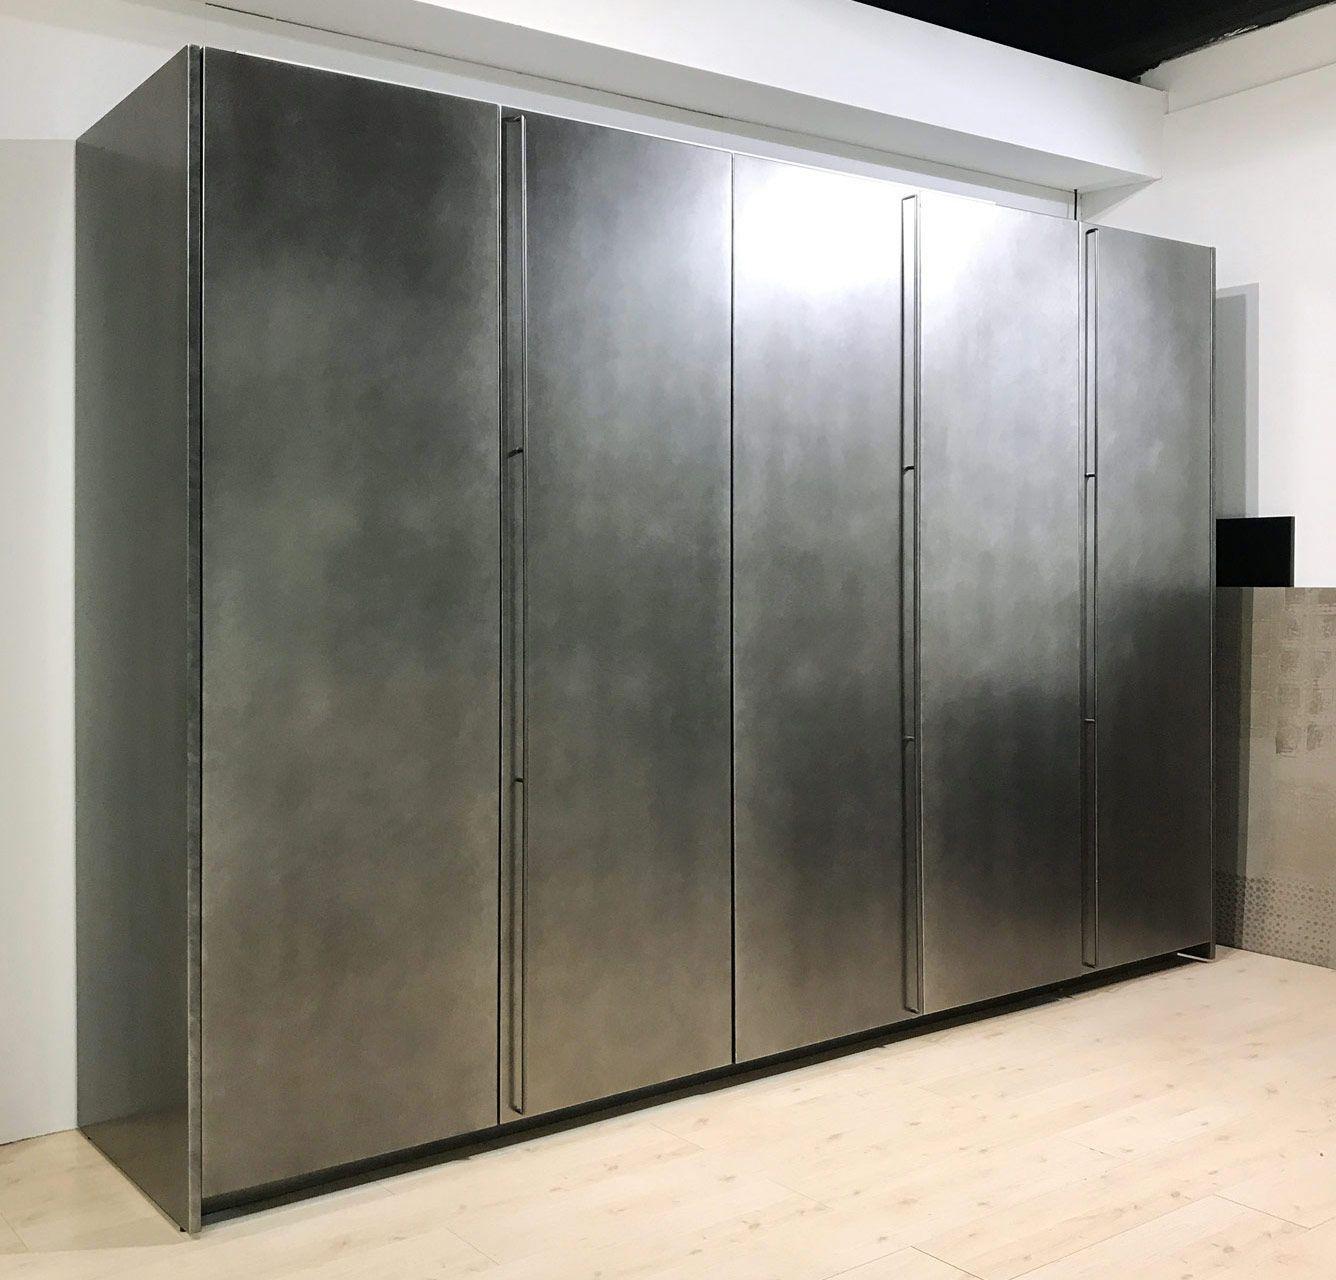 Cucina Verona Arredo 3 Opinioni | Mobili Bagno Shabby Ikea - Idee ...